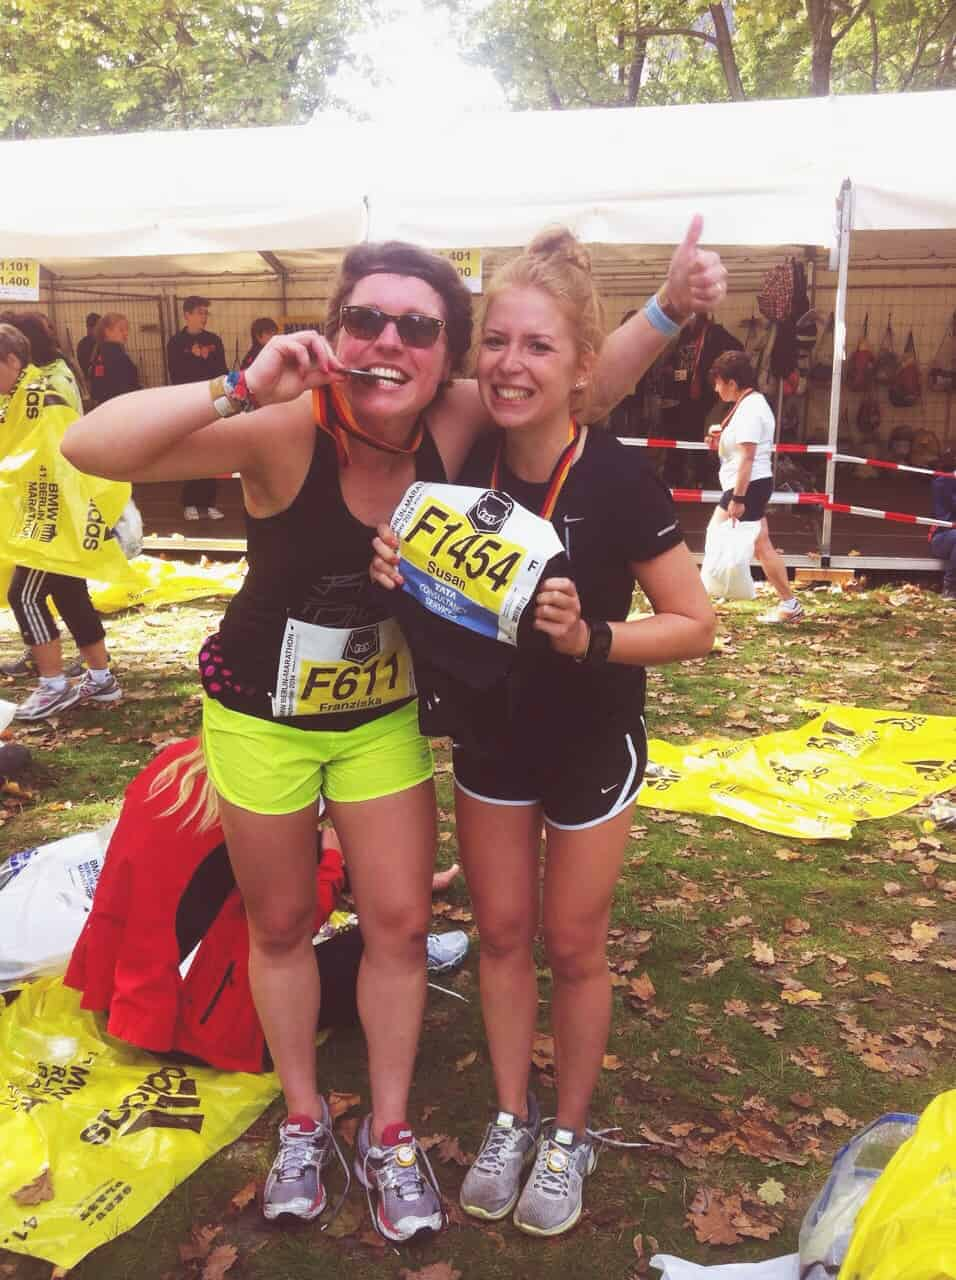 erster_marathon_raceday_5